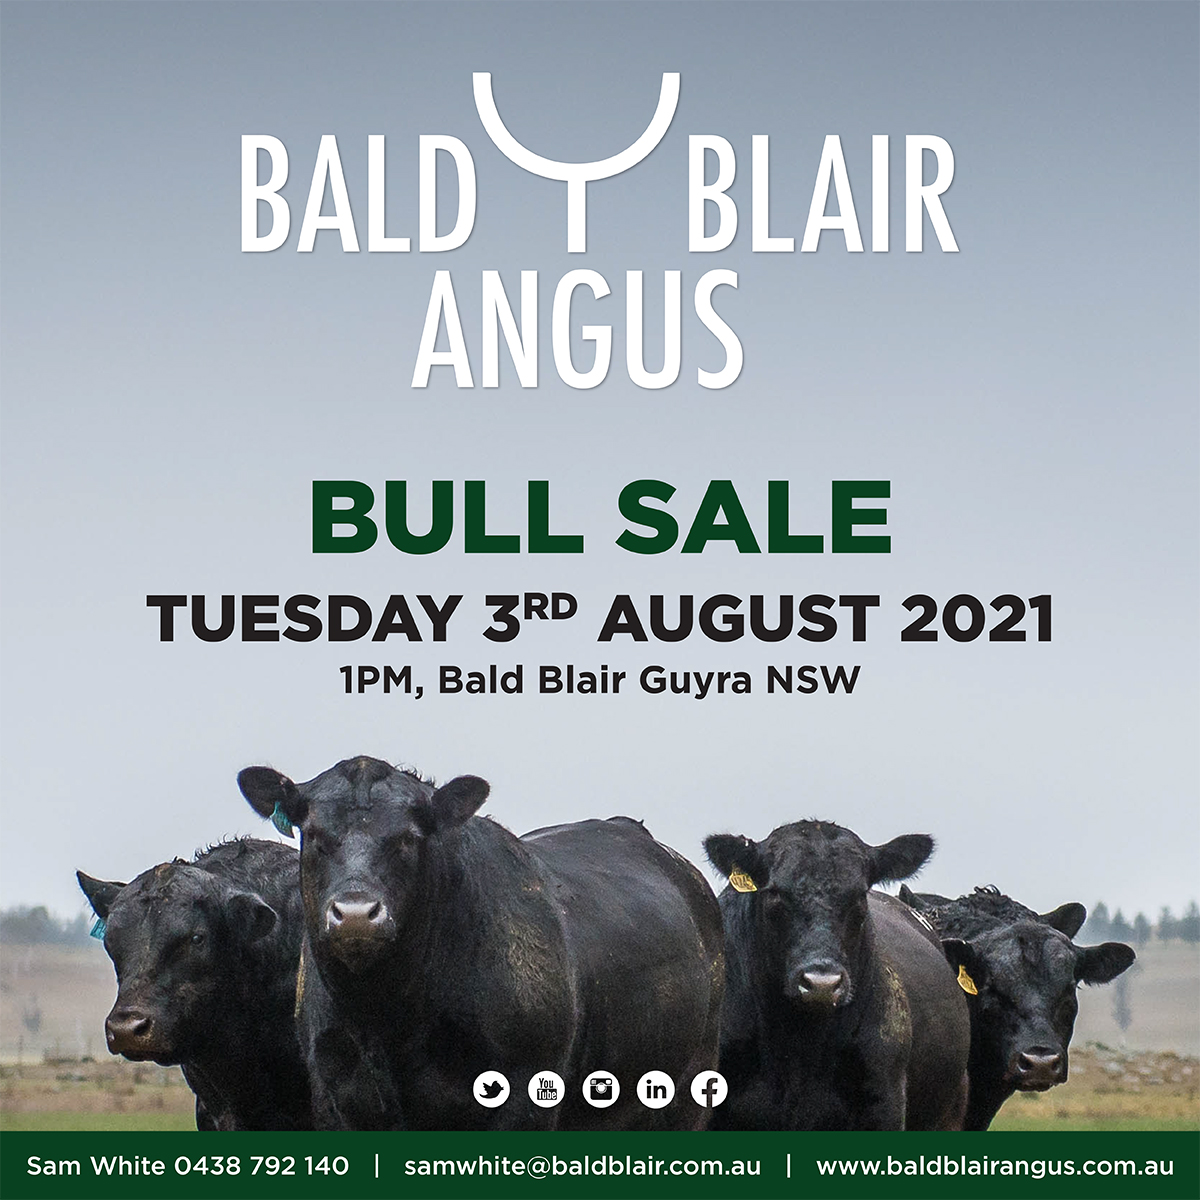 Bald Blair Angus Bull Sale